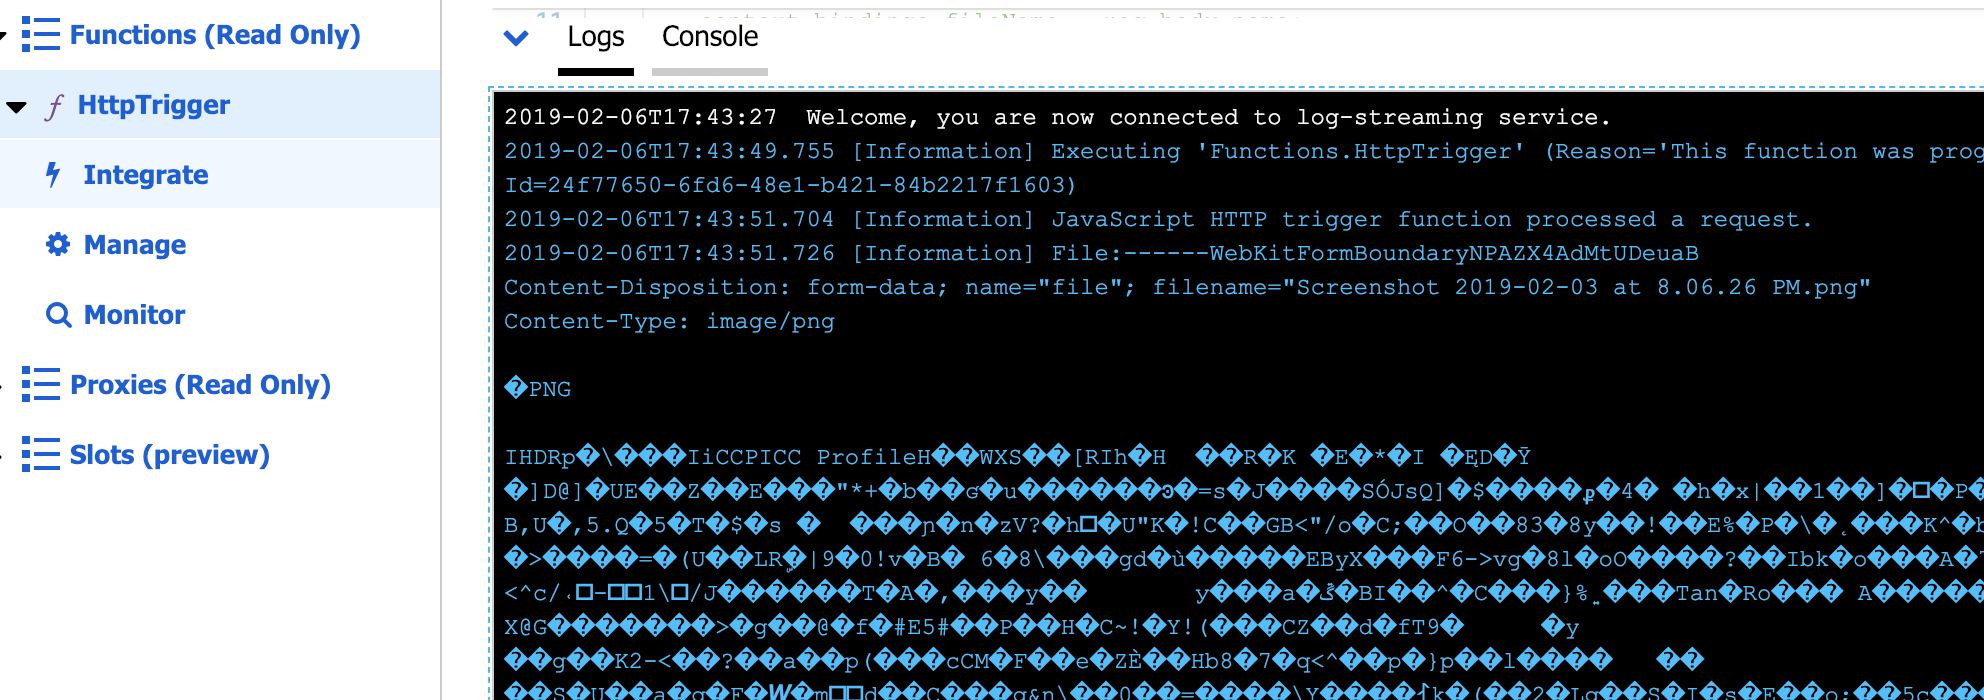 HttpTrigger with multipart formdata